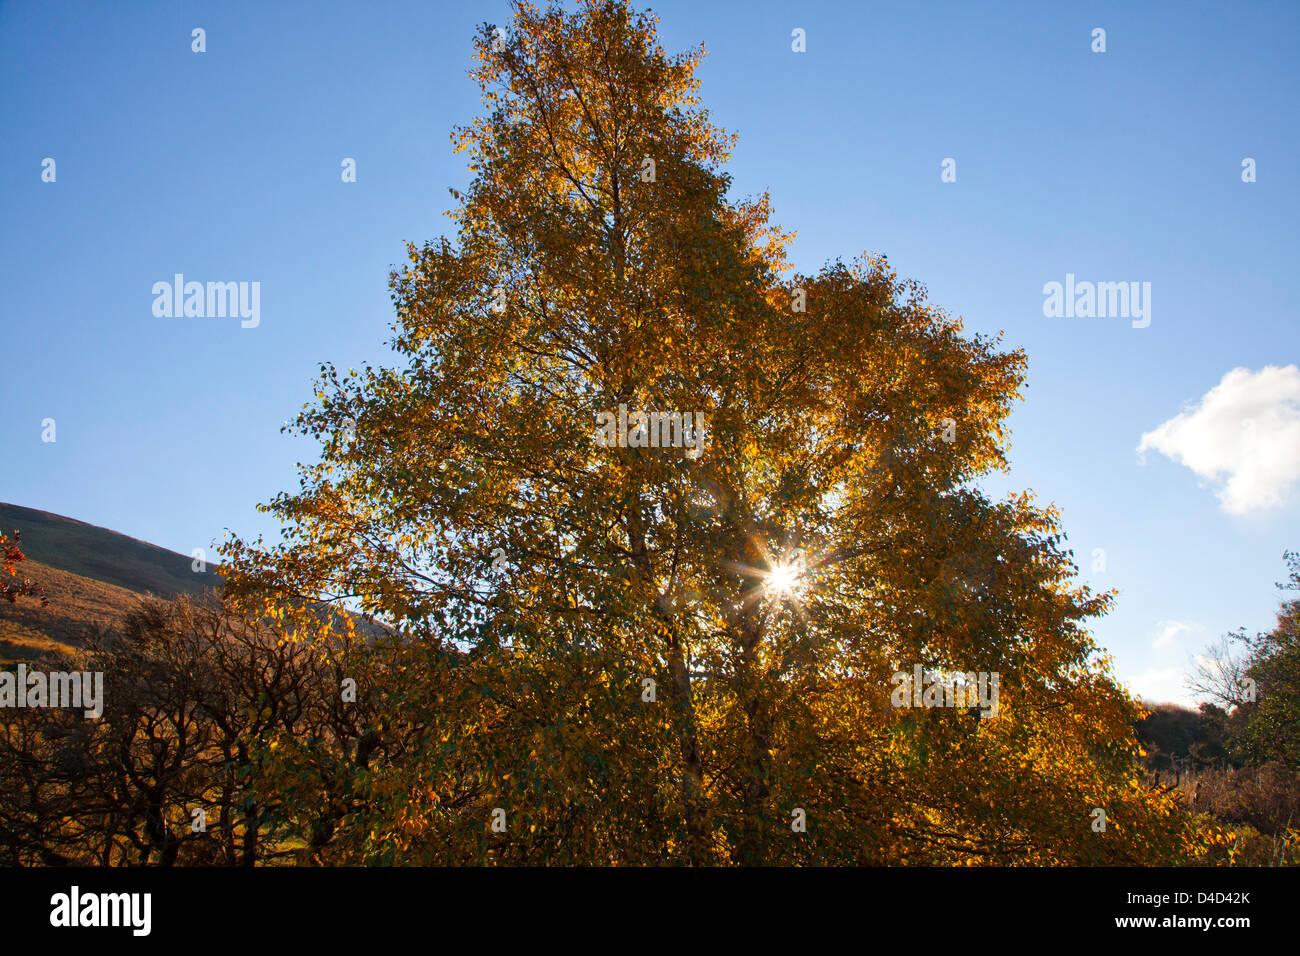 Autumn downy birch tree in Glenhest, Co Mayo, Ireland. - Stock Image